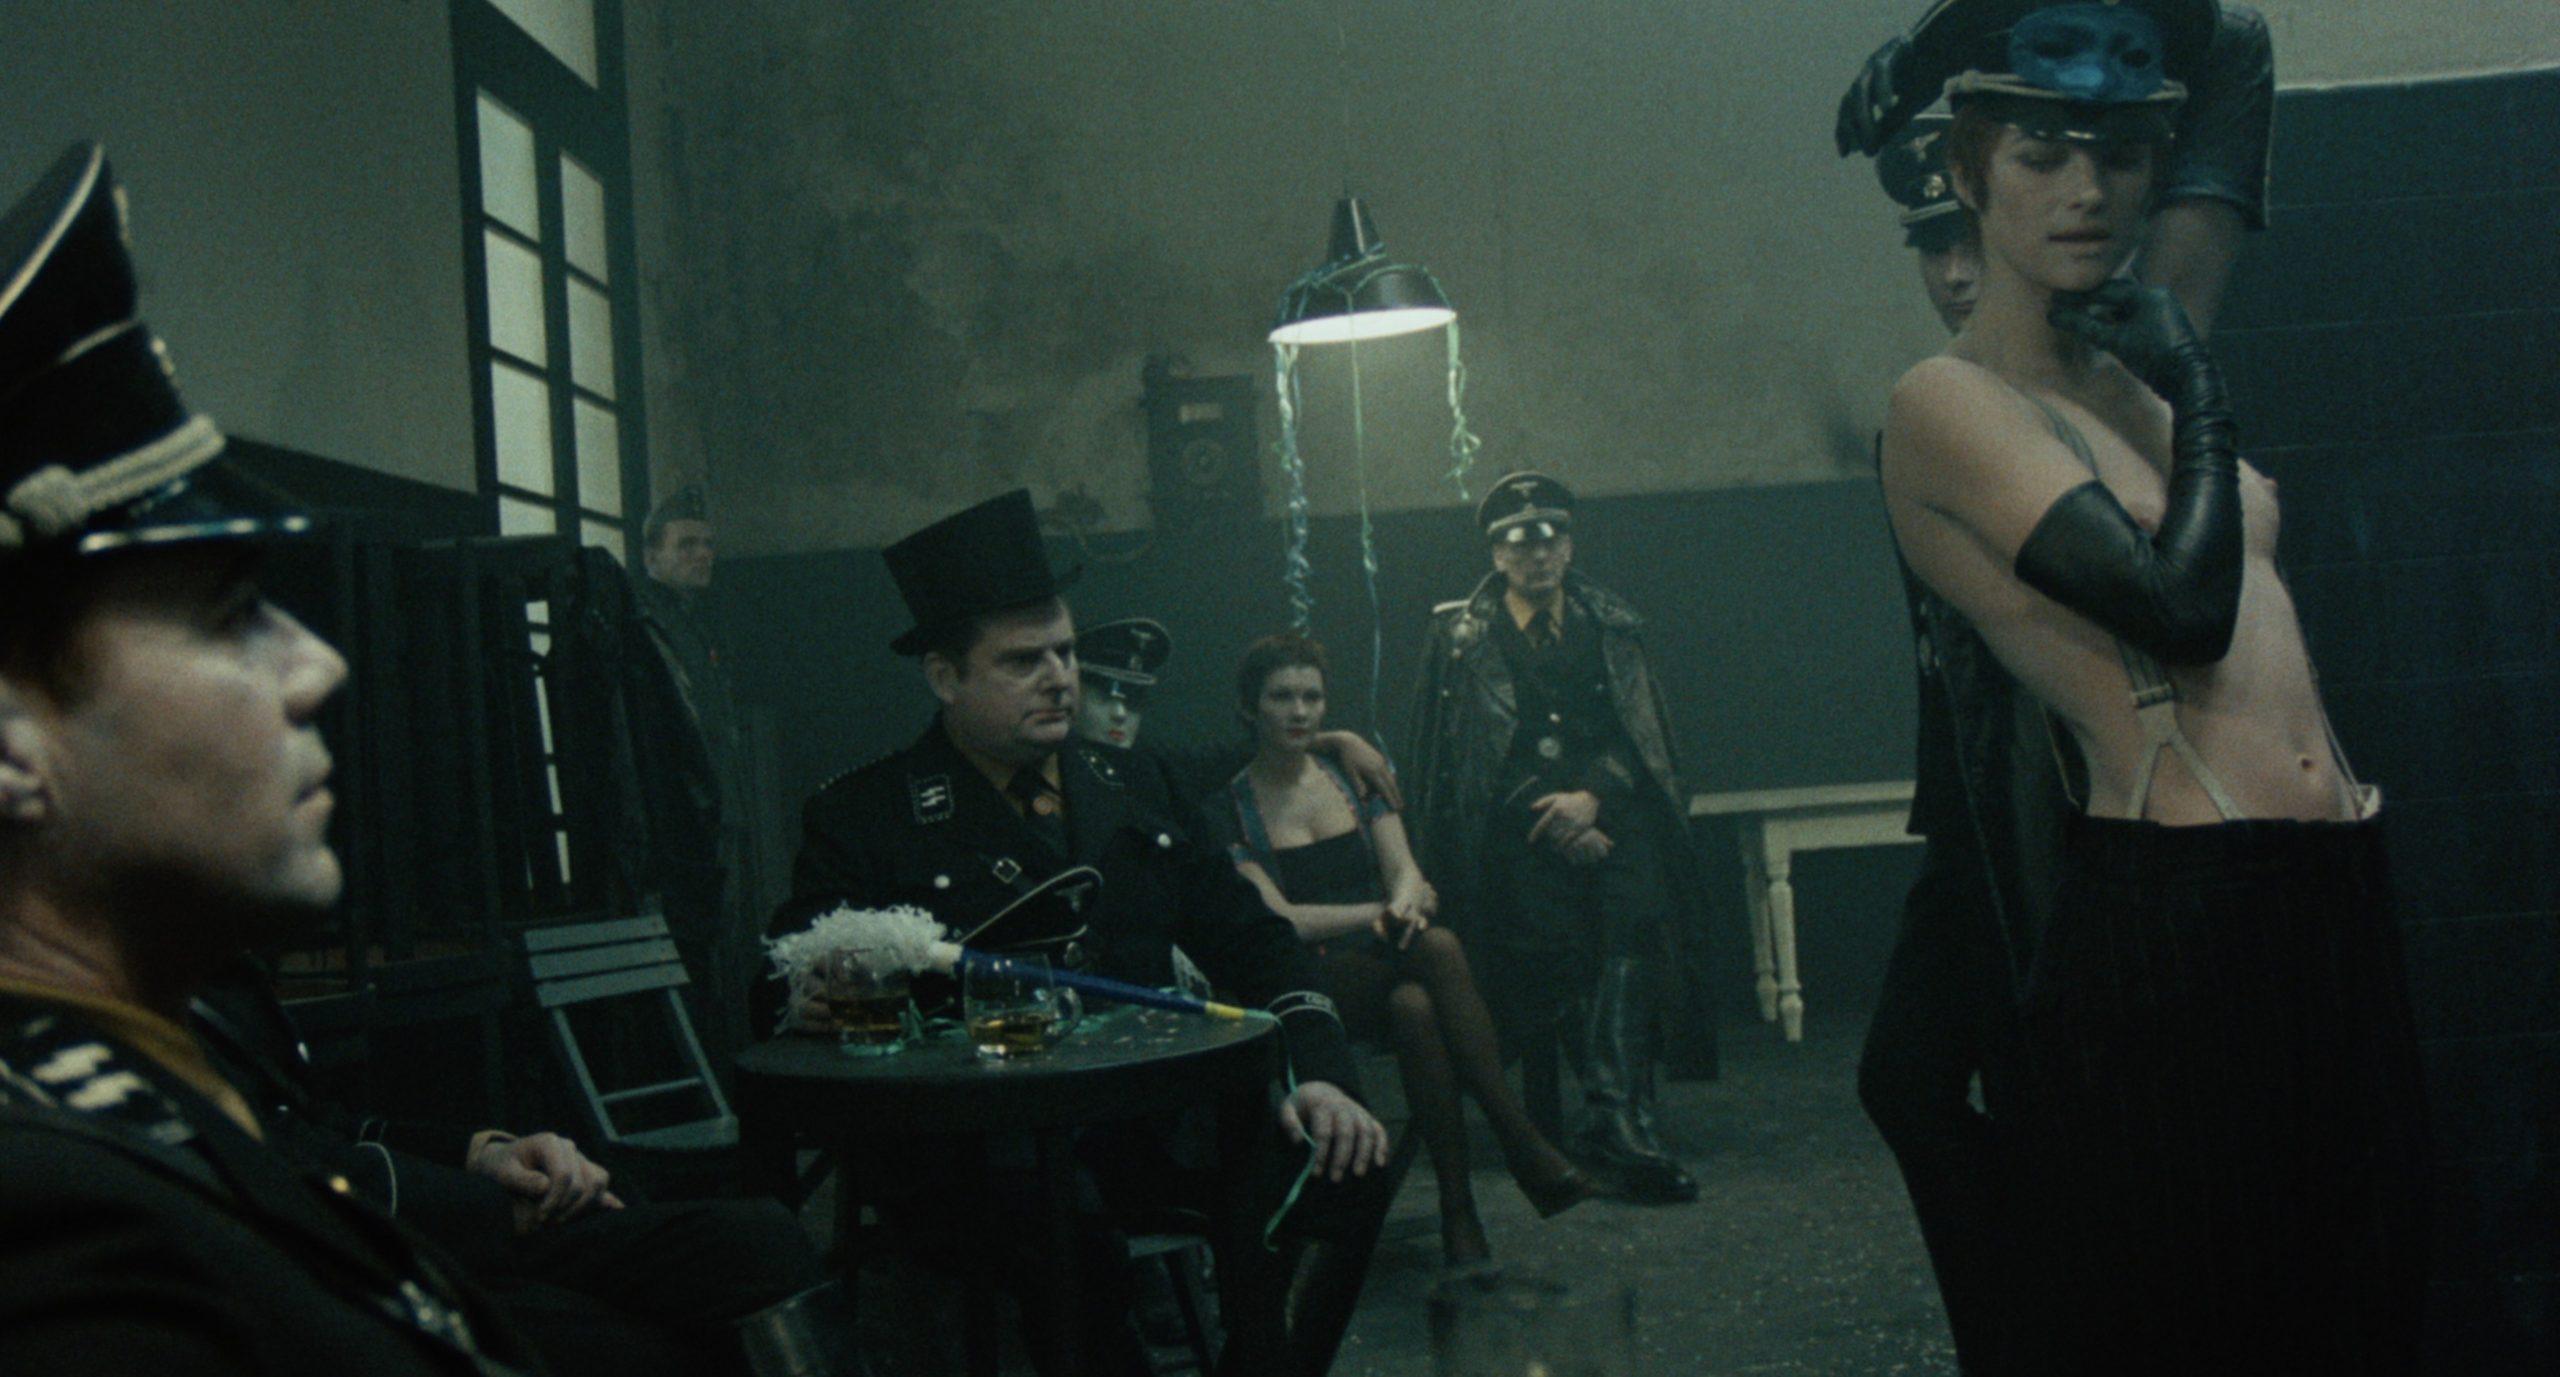 CultFilms Presents Liliana Cavani's THE NIGHT PORTER 4K Restoration on Blu-ray and Digital (30 November)